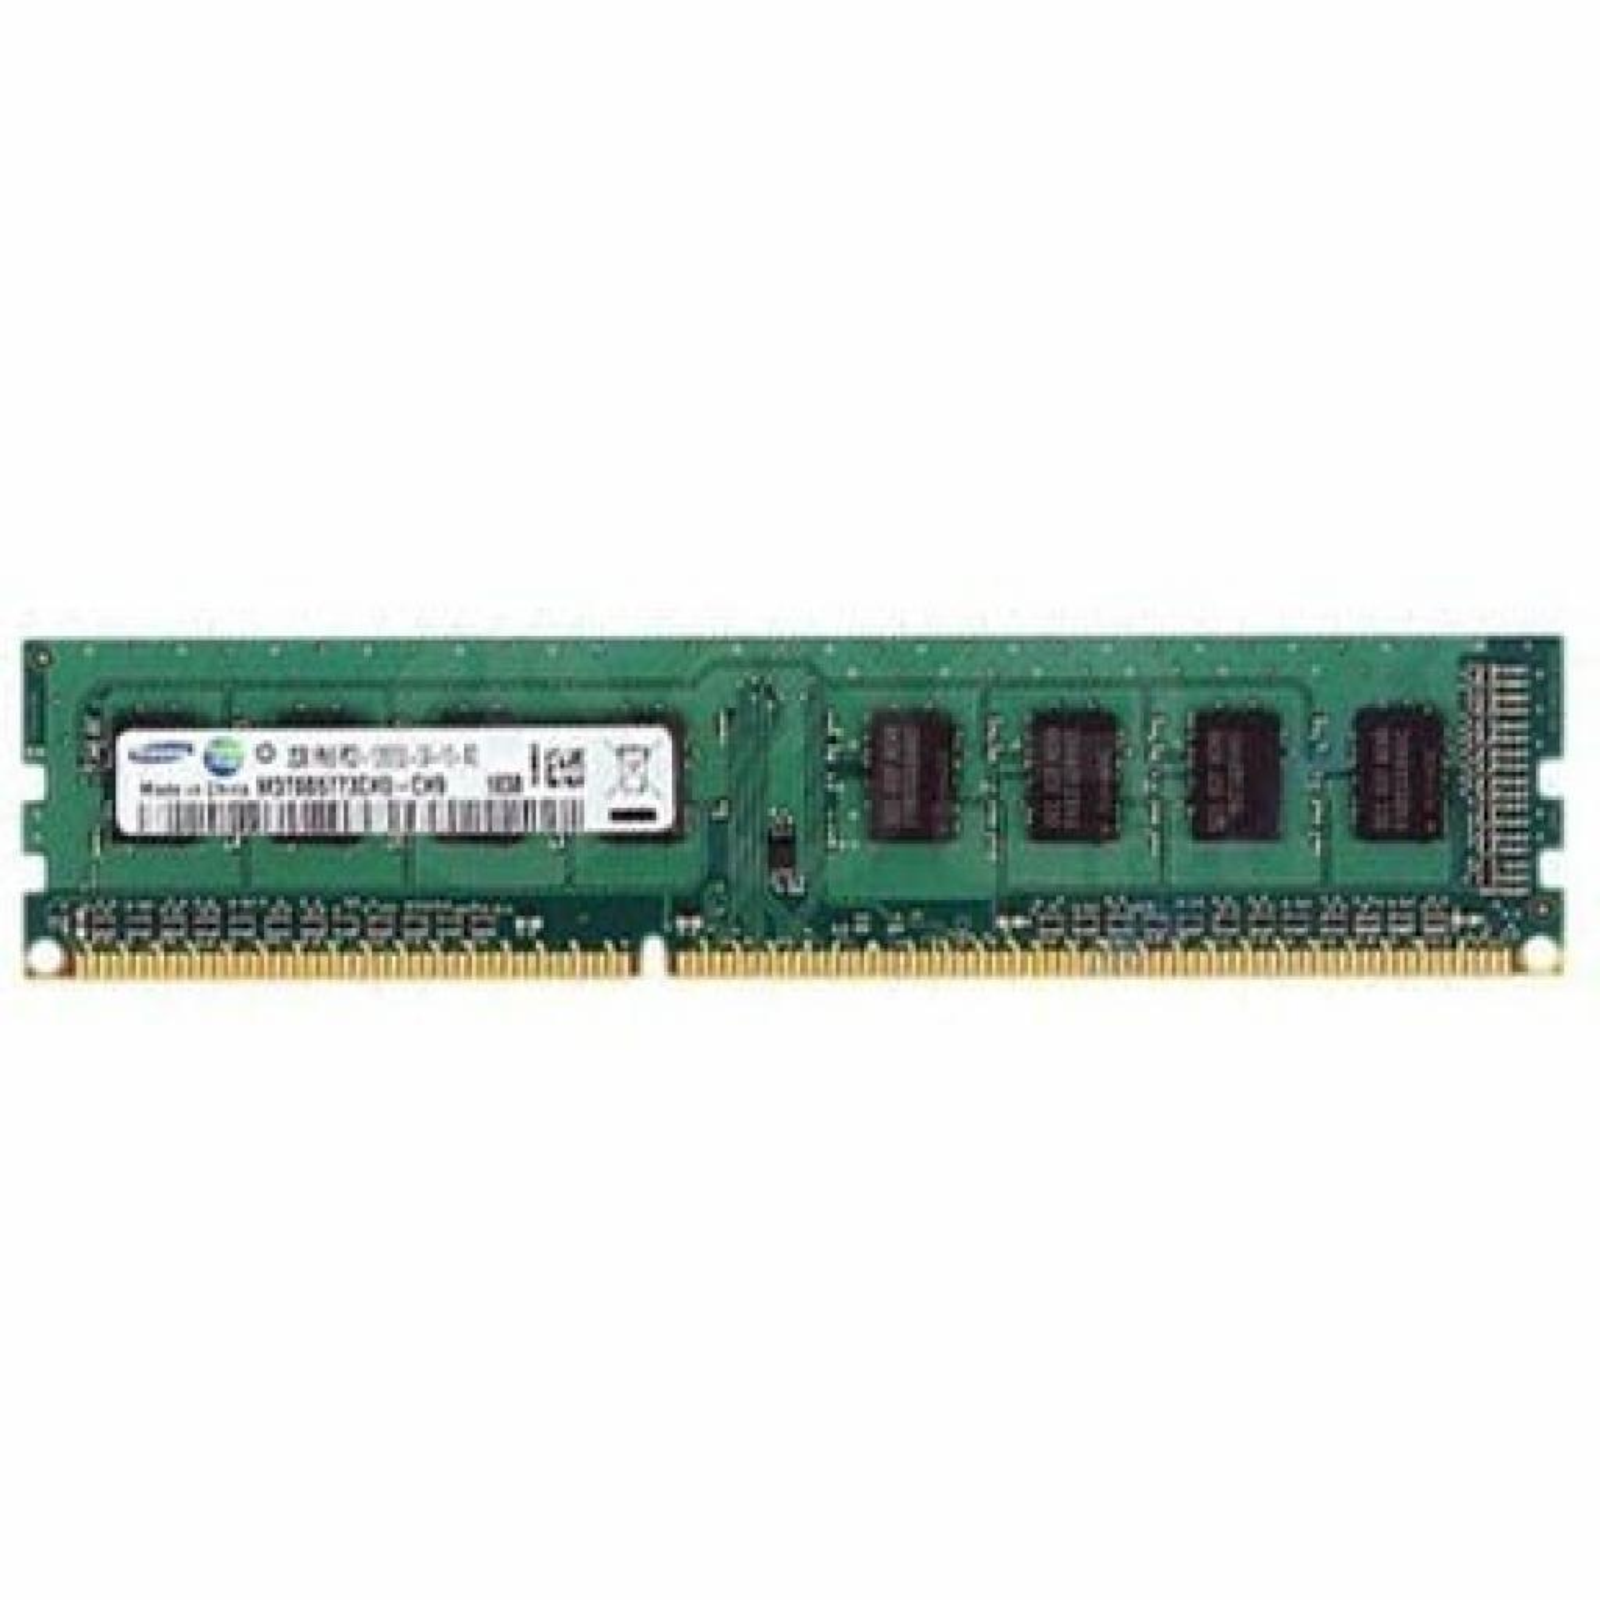 Модуль памяти для компьютера DDR3 2GB 1600 MHz Samsung (Original)